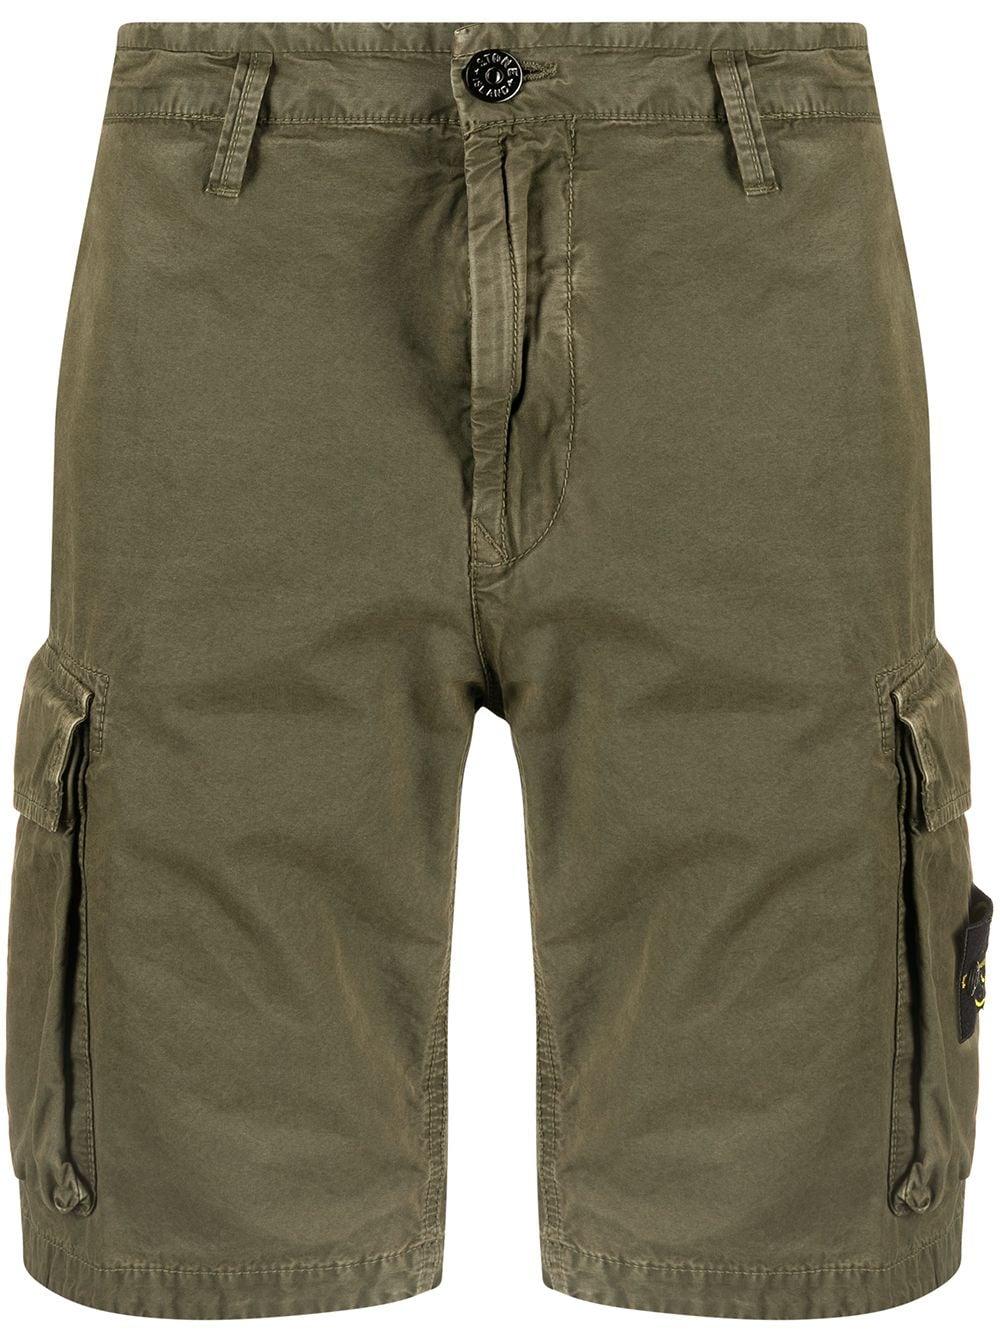 <p class='small-title'>STONE ISLAND</p>Bermuda Shorts